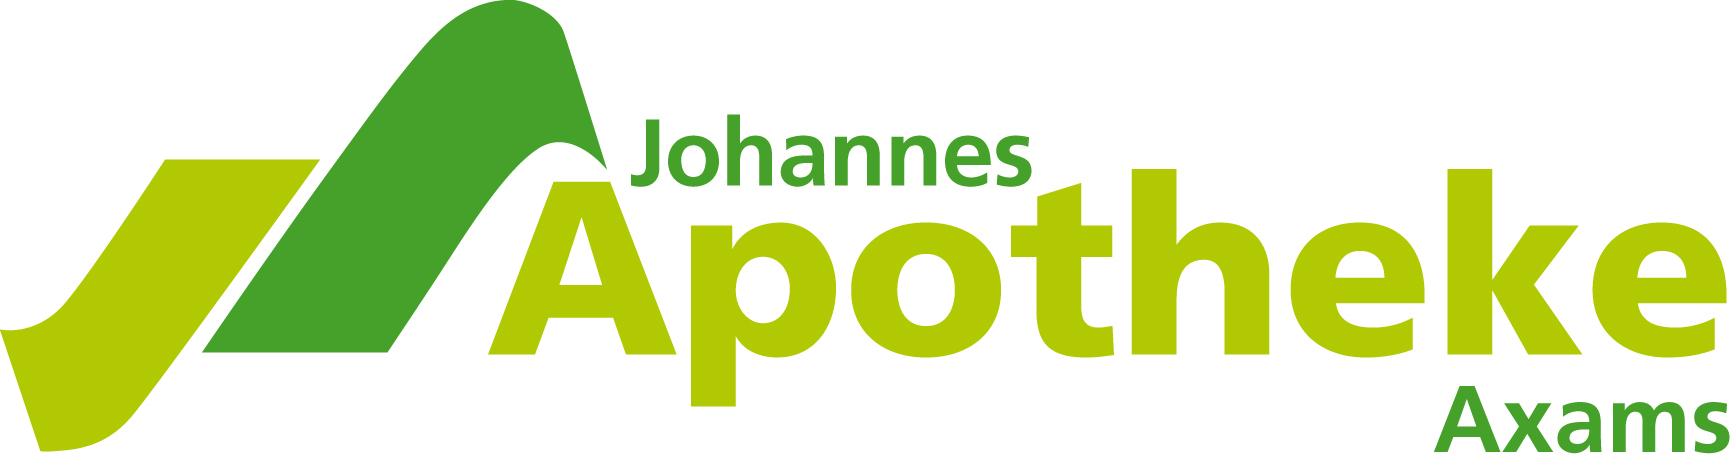 Johannes Apotheke Axams